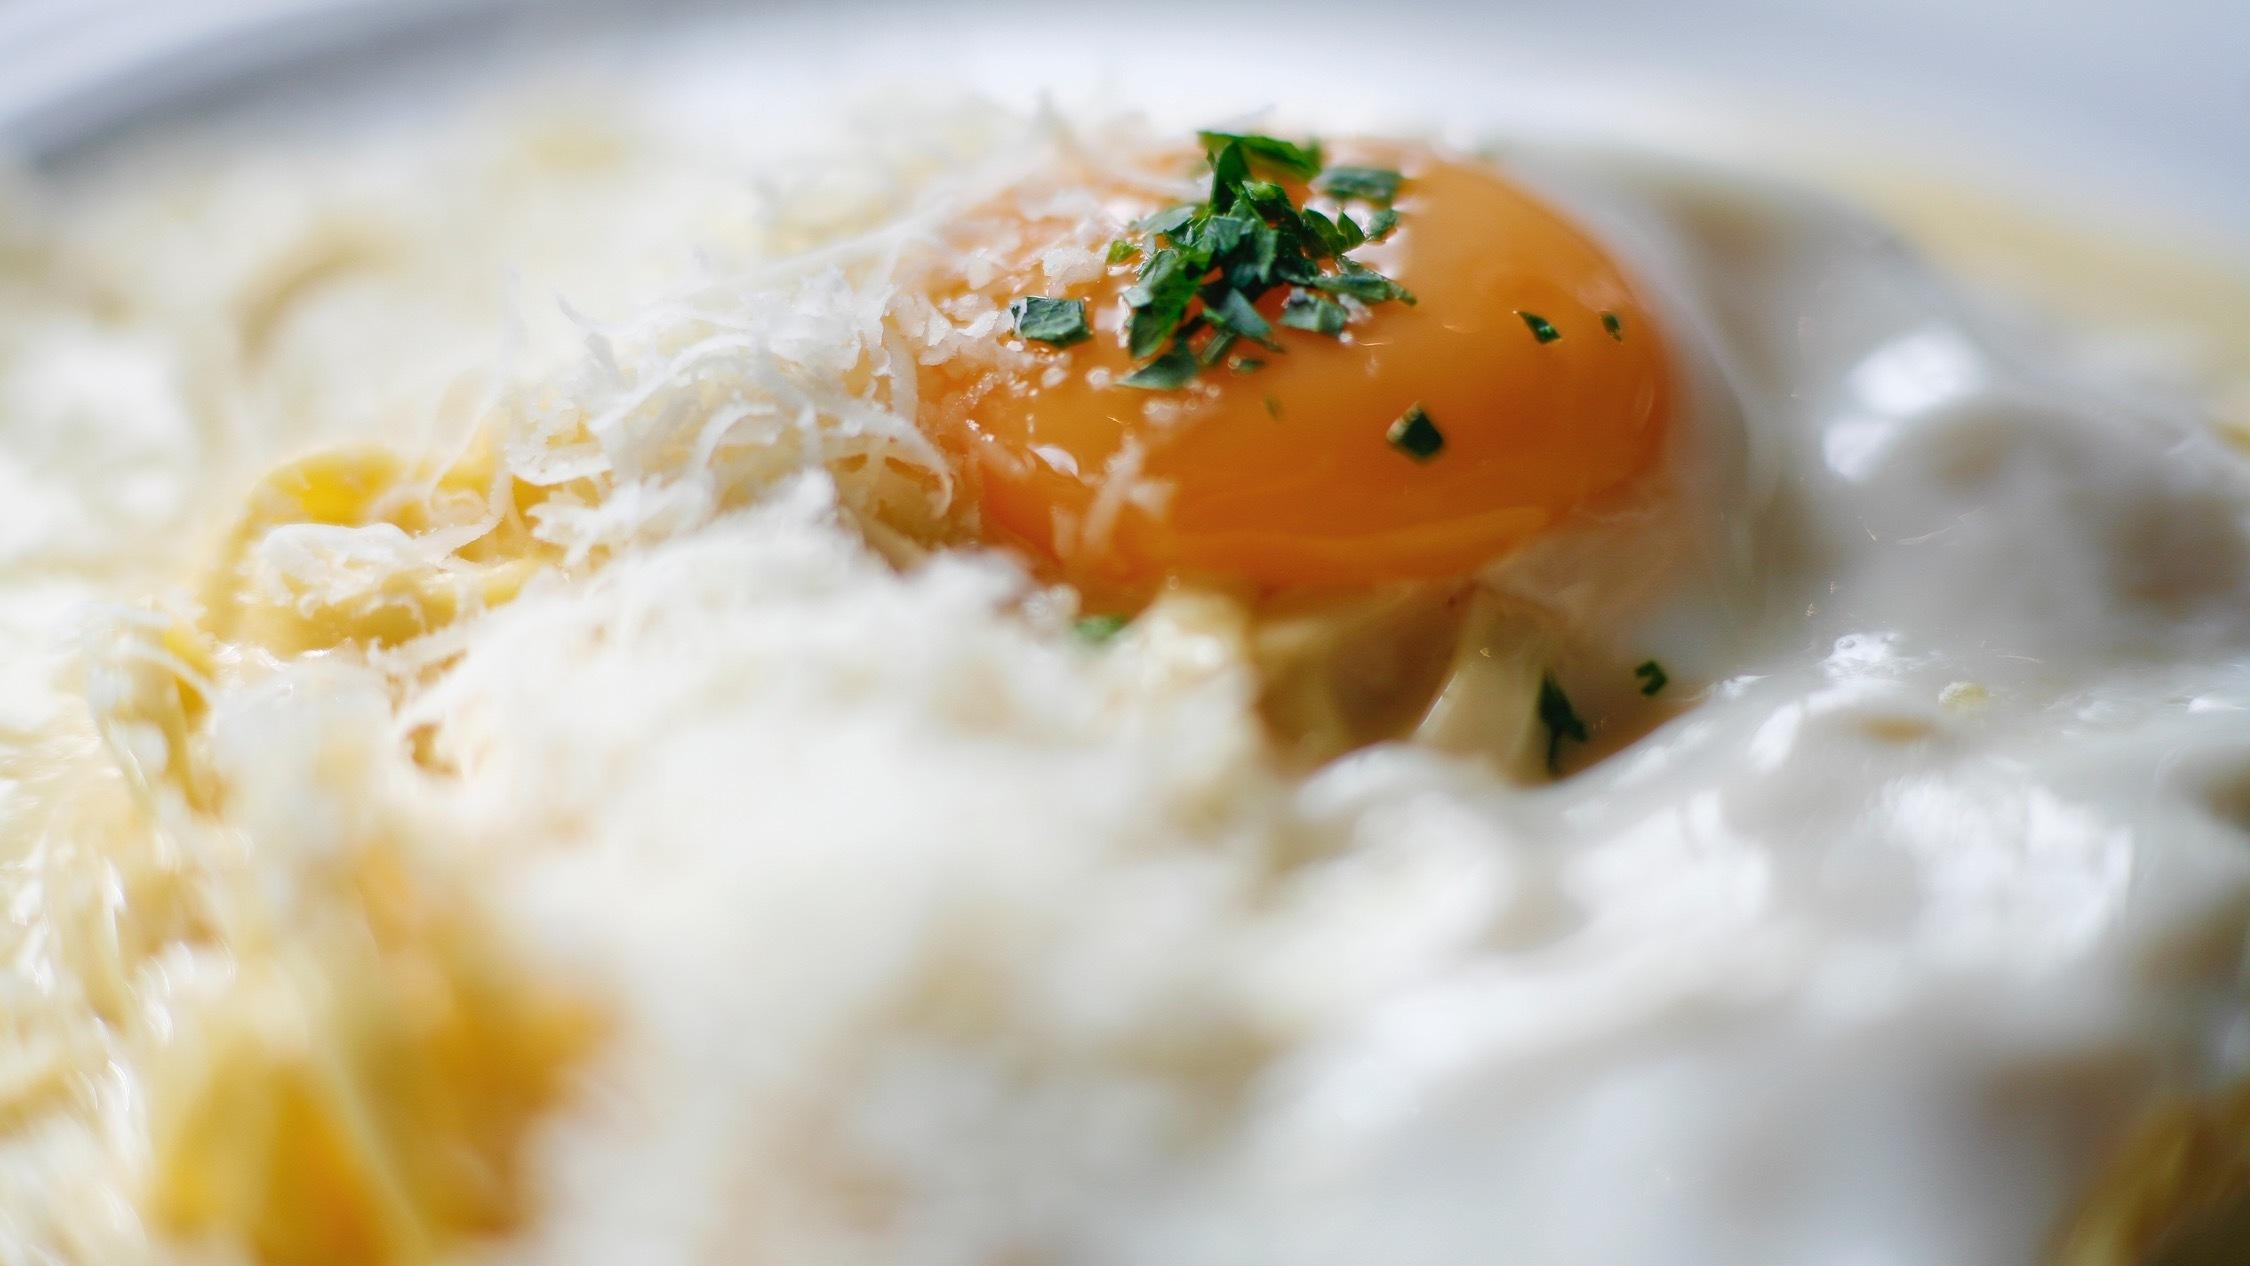 Eggs at Buon Ricordo Paddington